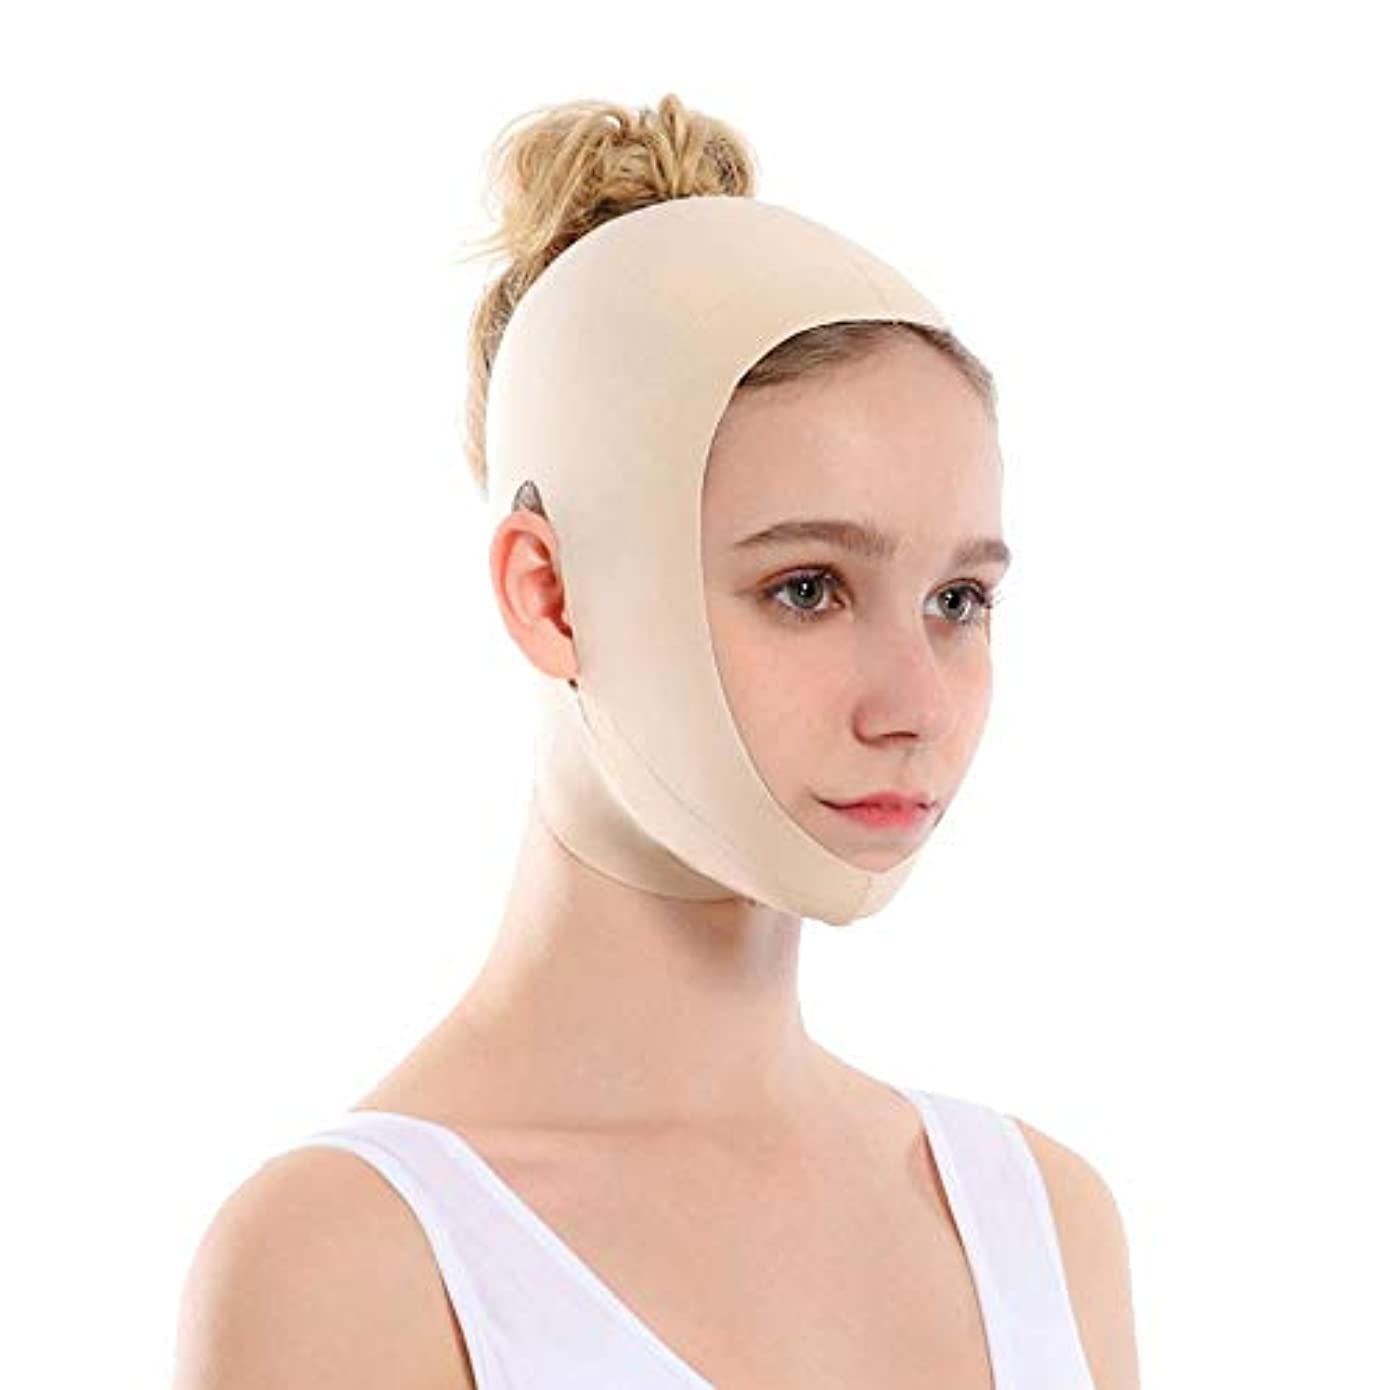 GYZ 顔を持ち上げるアーティファクトVフェイス包帯リフティング引き締め睡眠薄い顔を整形持ち上げる顔を二重あご矯正 - 肌の色 Thin Face Belt